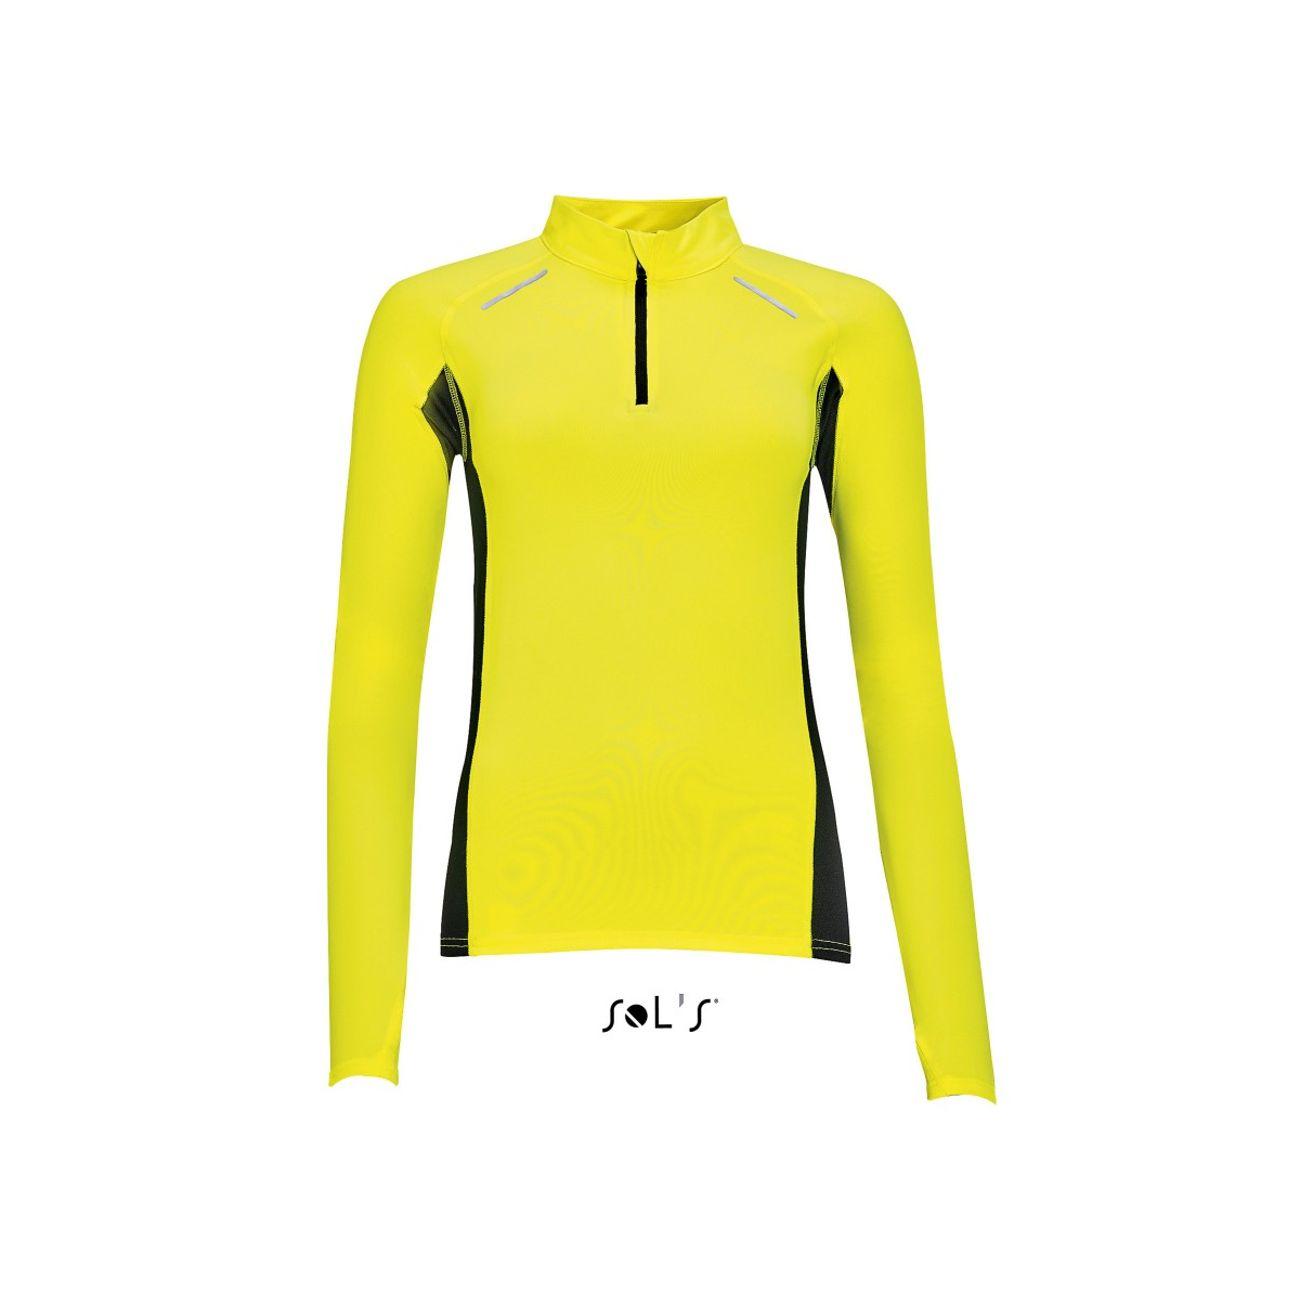 Course à pied femme SOL S t-shirt running manches longues - Femme - 01417 2bc69a177326